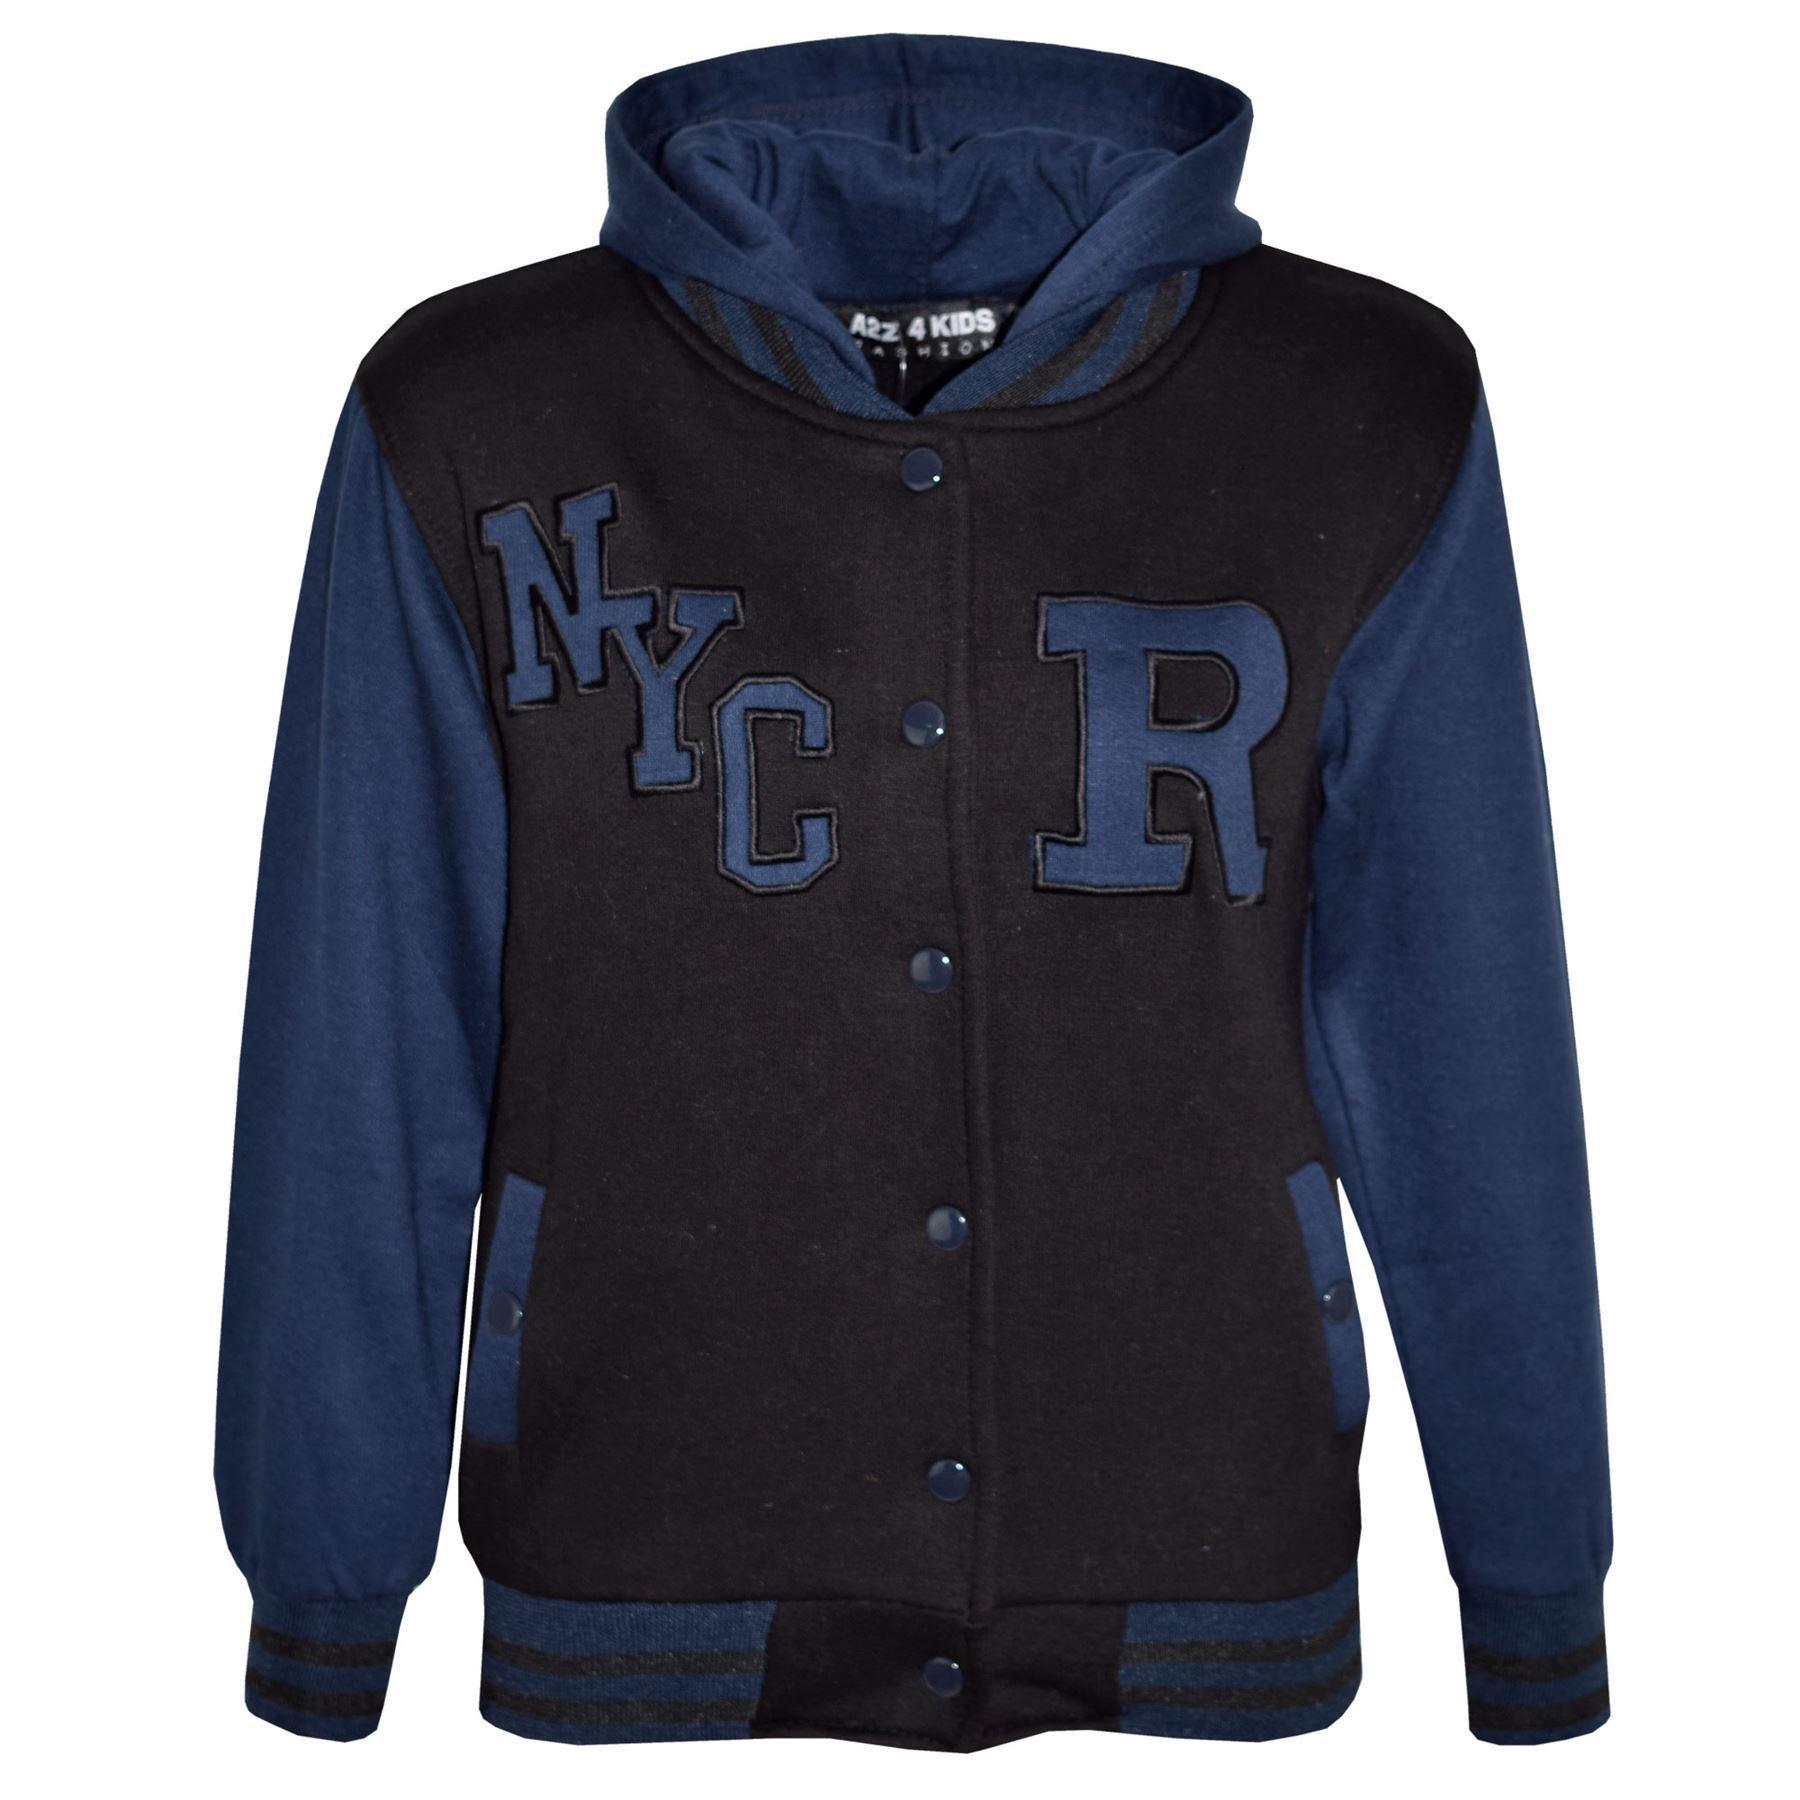 Kids-Girls-Boys-R-Fashion-NYC-Baseball-Hooded-Jacket-Varsity-Hoodie-5-13-Years